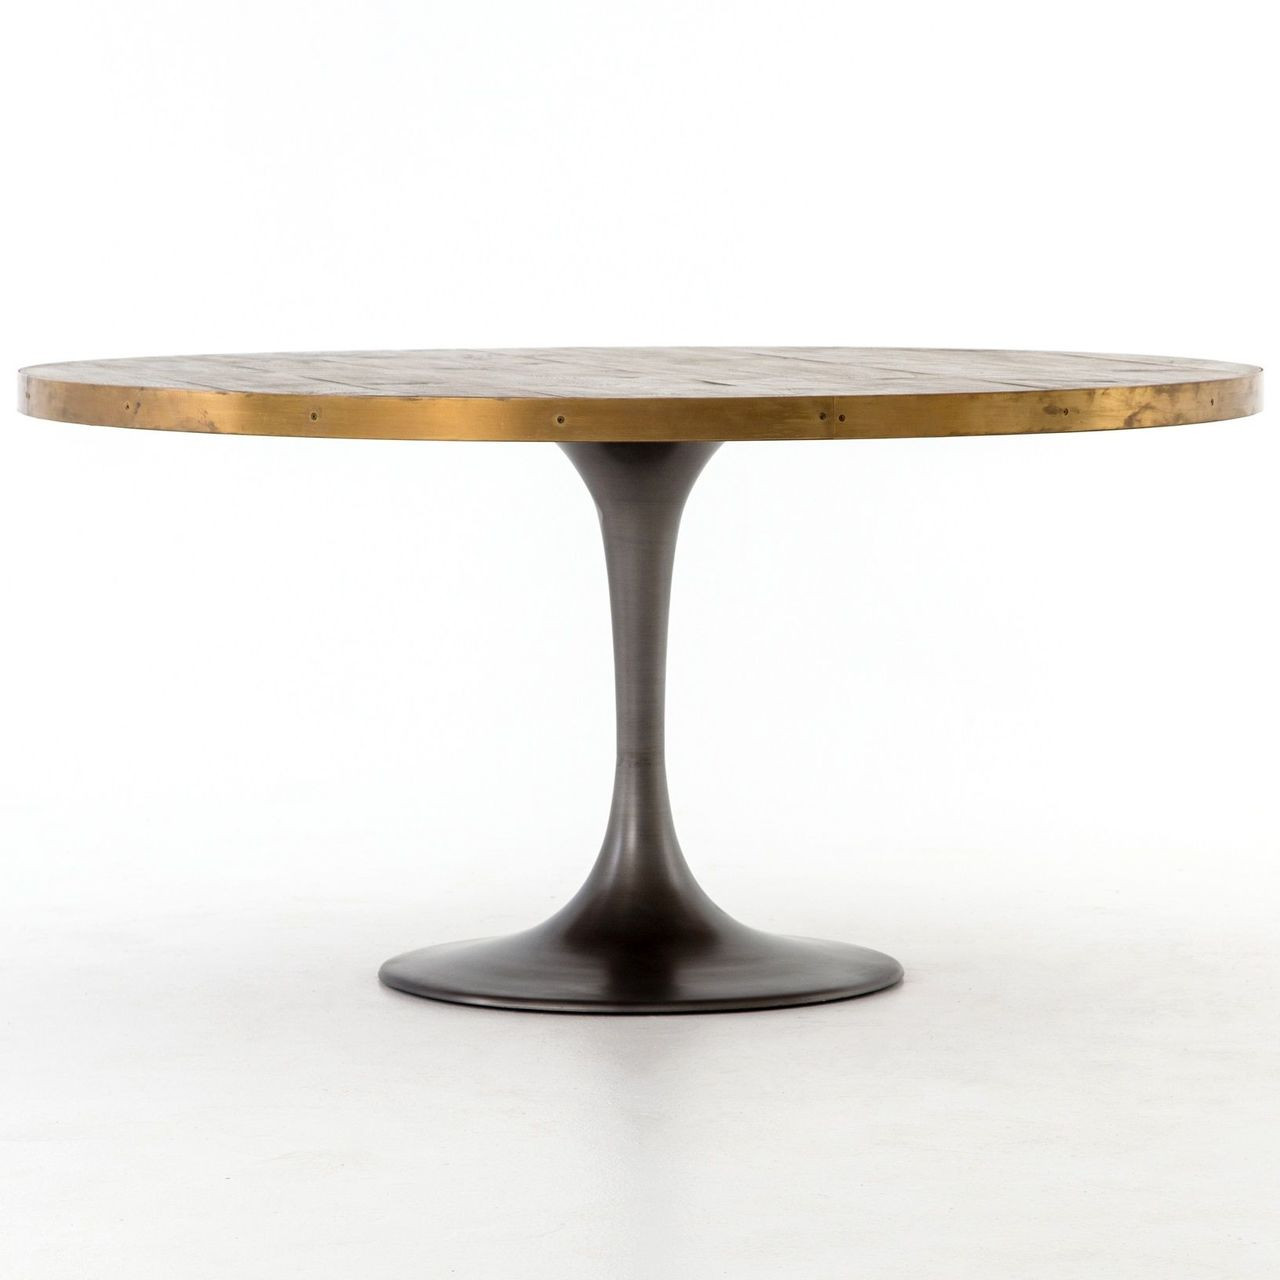 Evans Industrial Tulip Oak Wood Top Round Dining Table Zin Home - Tulip table wood top